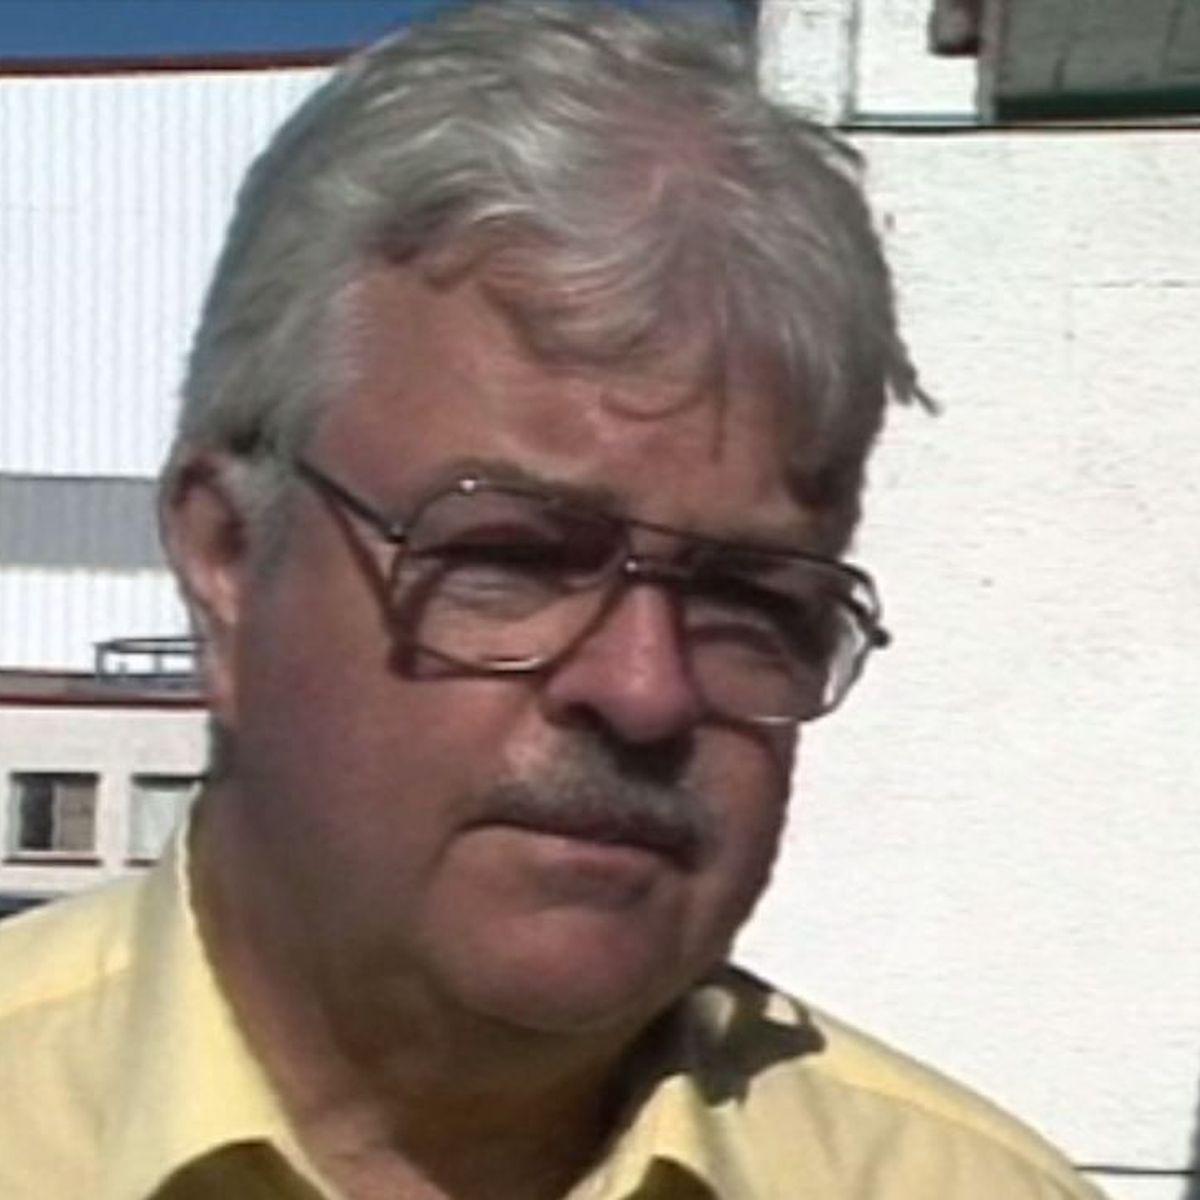 Disparition de John Crosbie, ministre canadien des pêches pendant la guerre de la morue